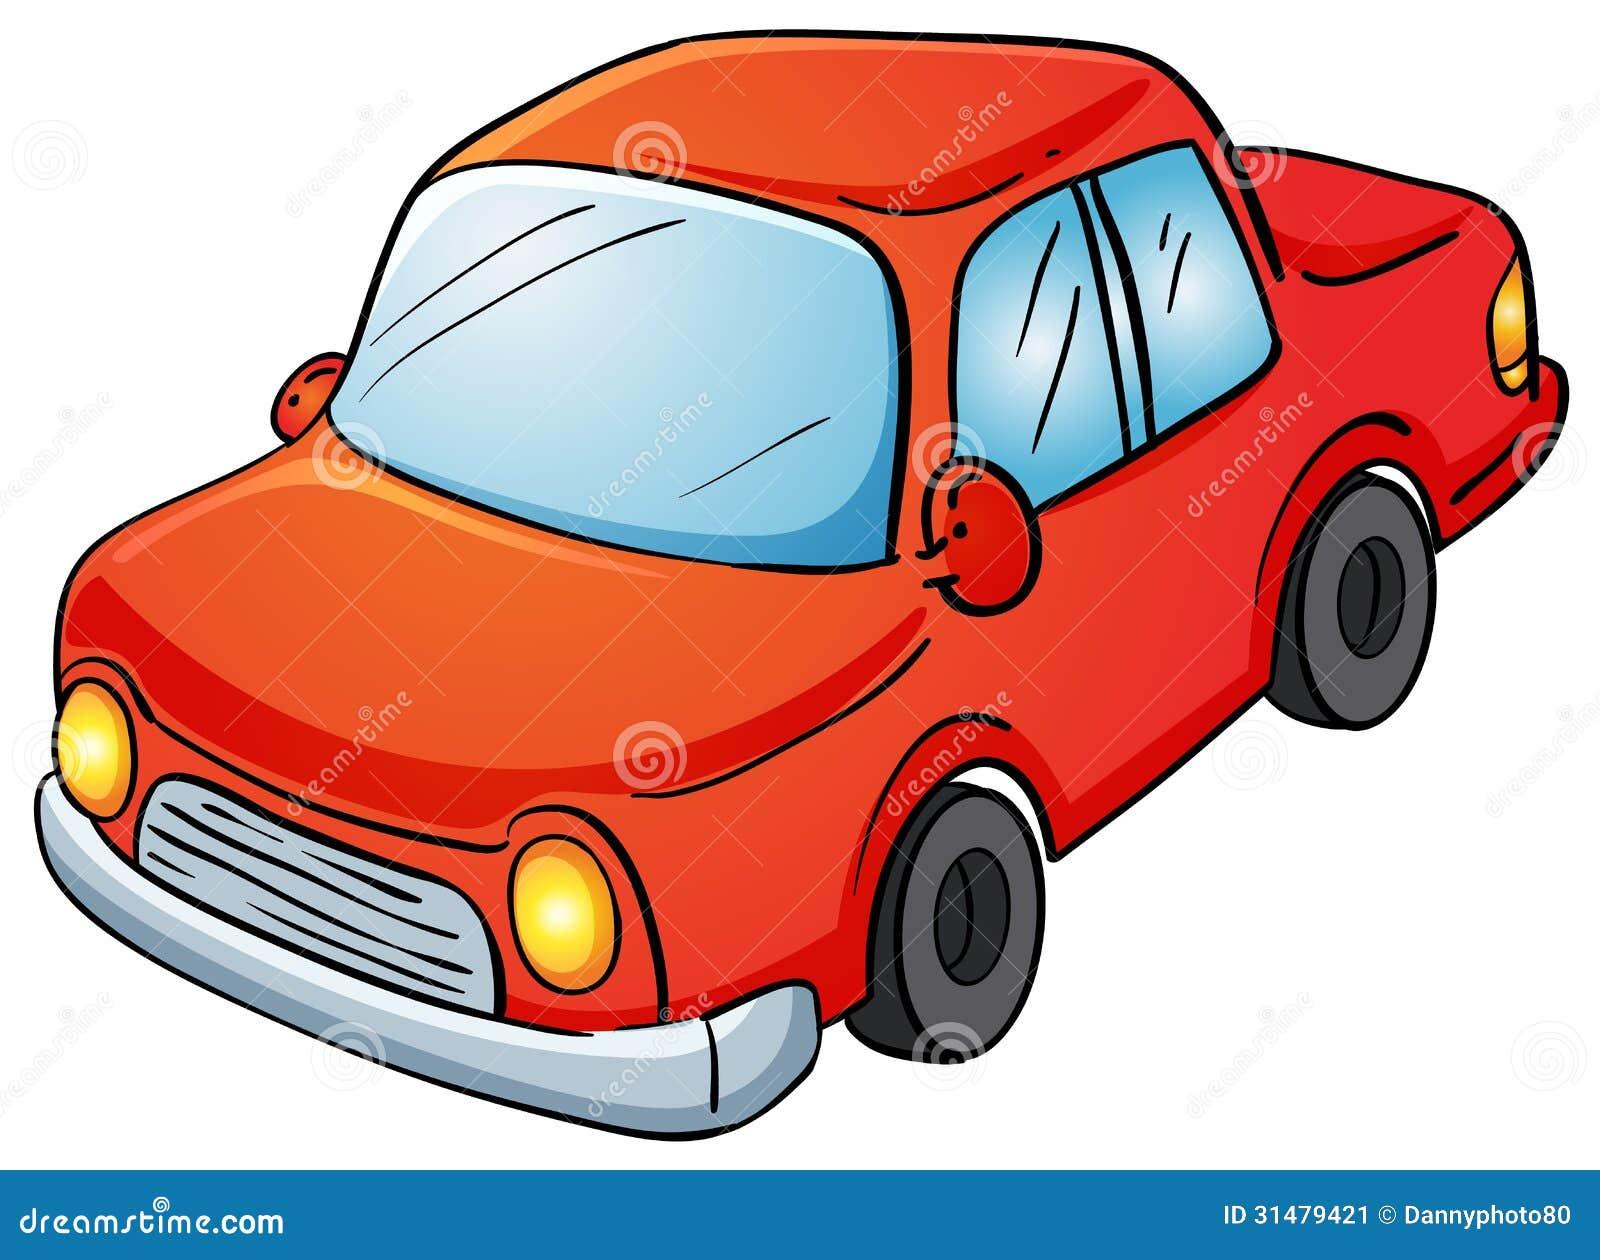 car clip art illustrations - photo #16